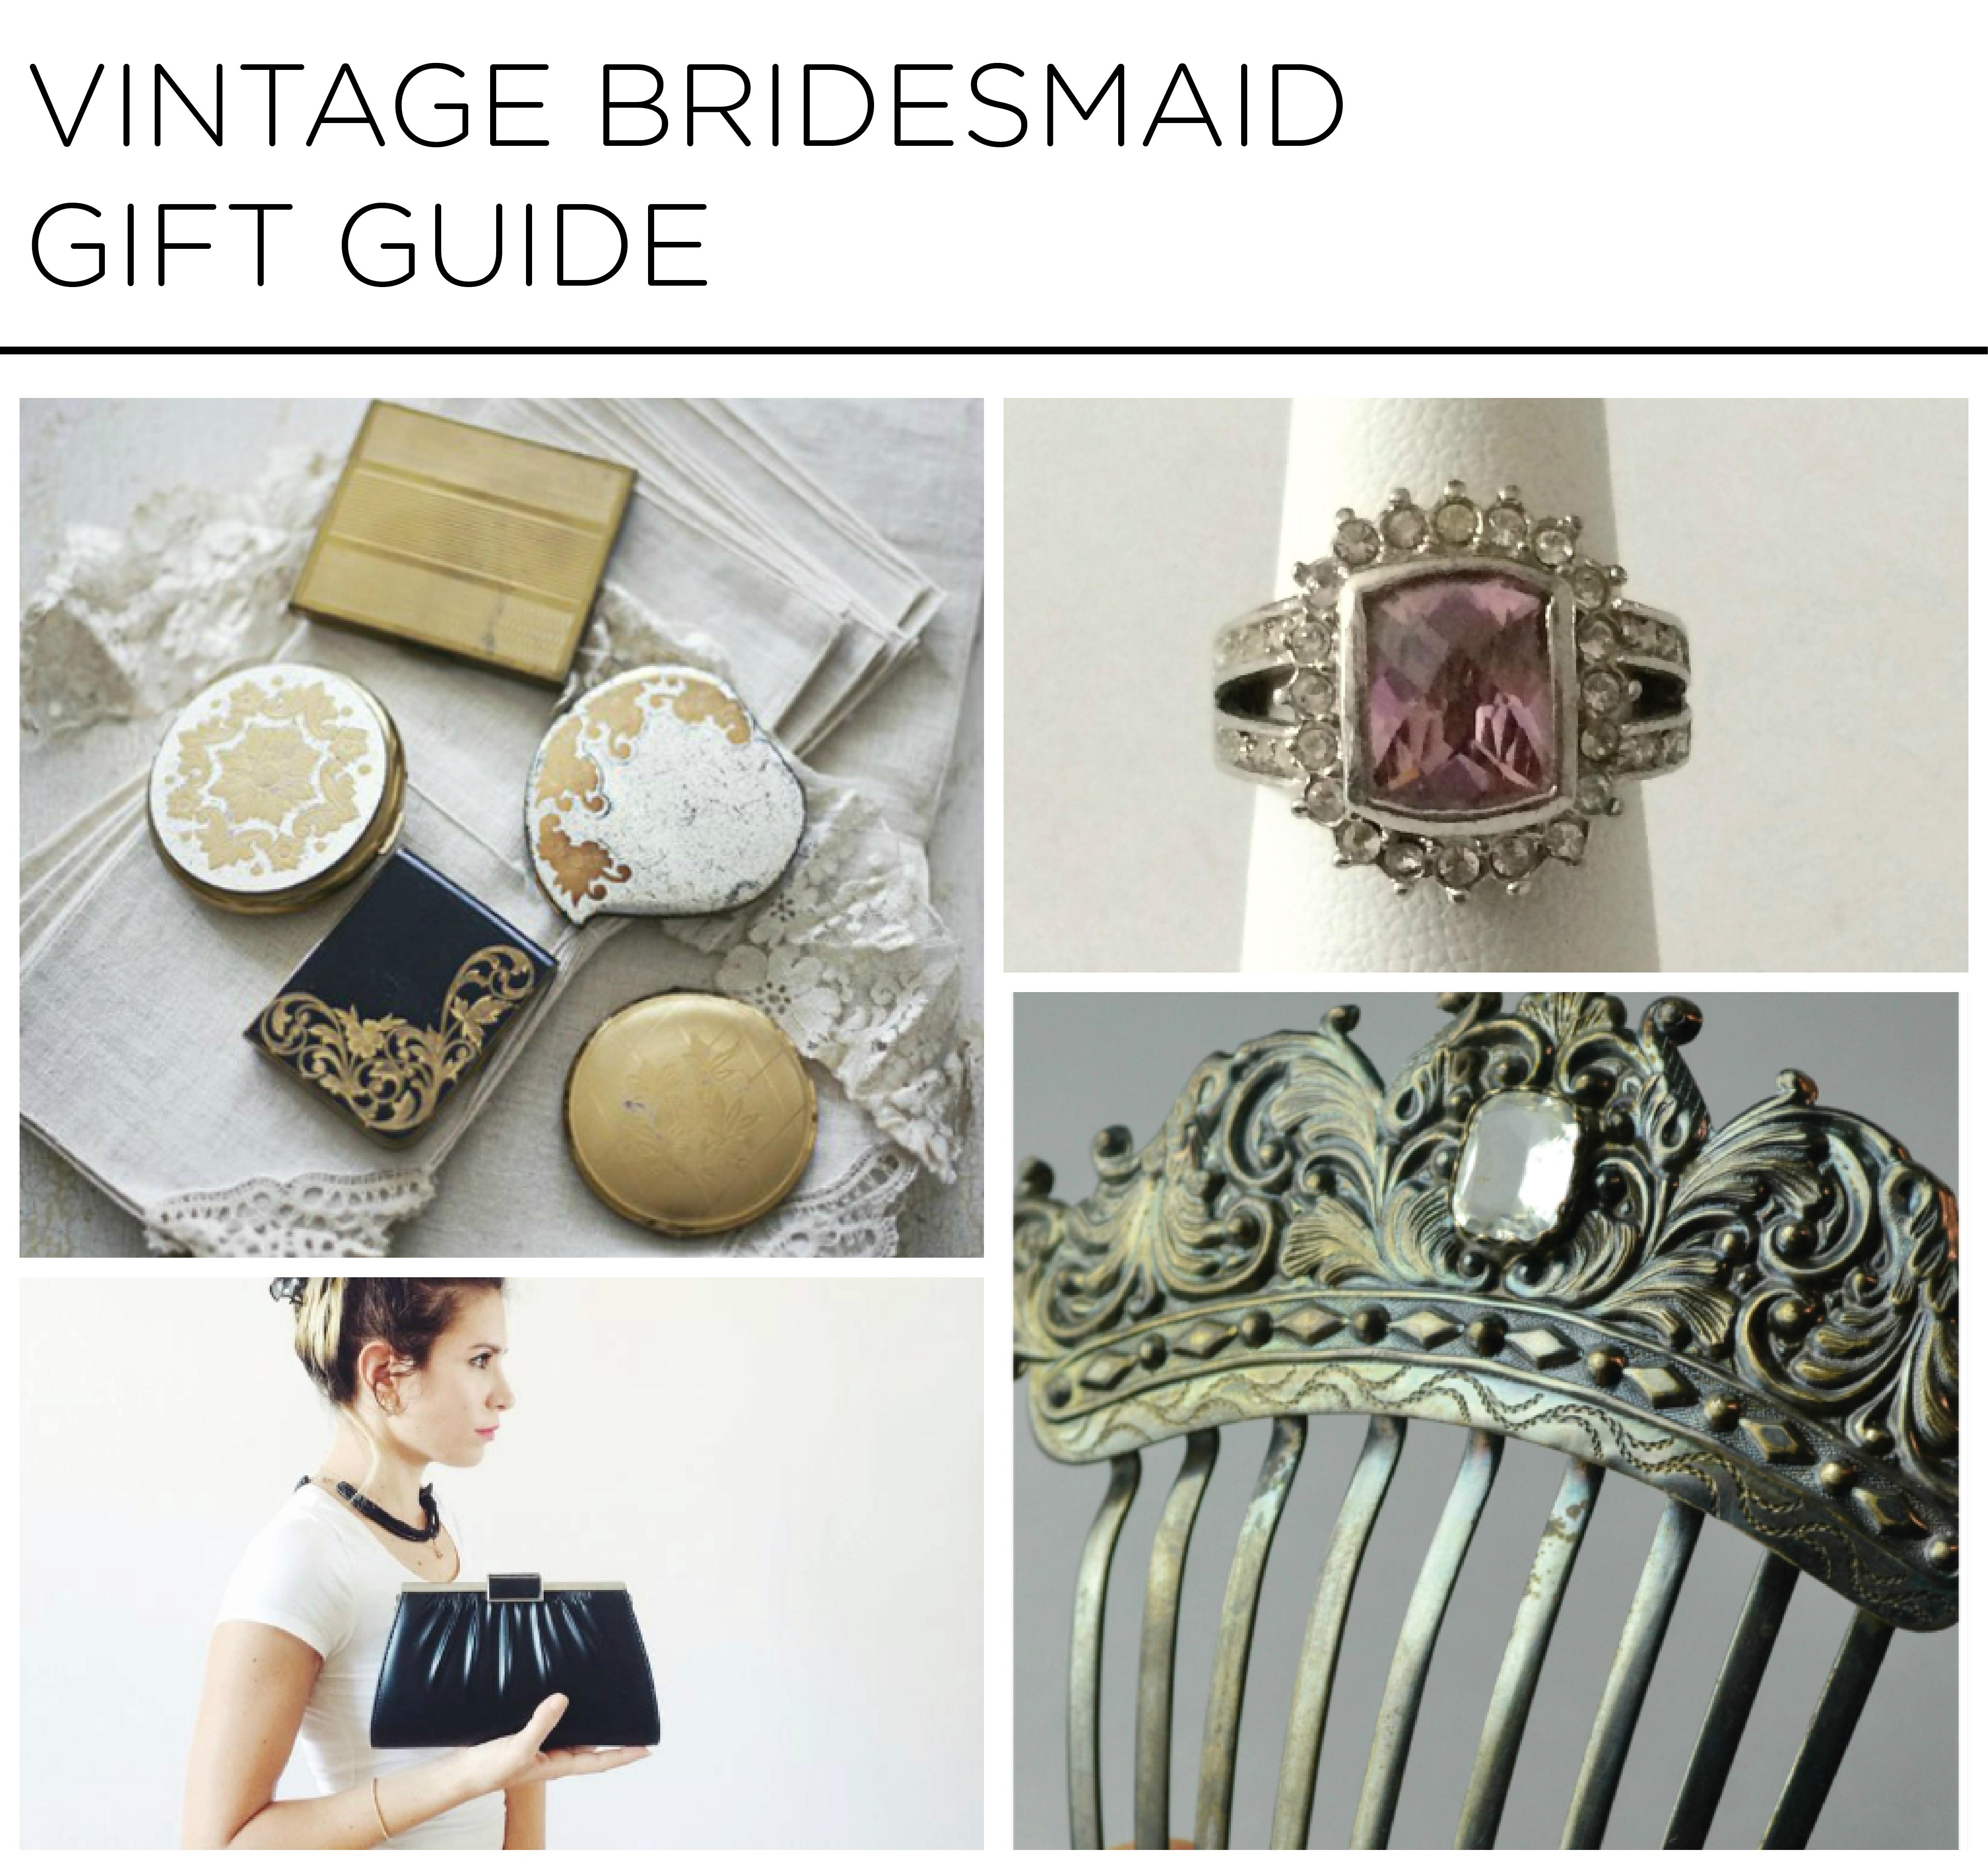 Vintage Gift Guide